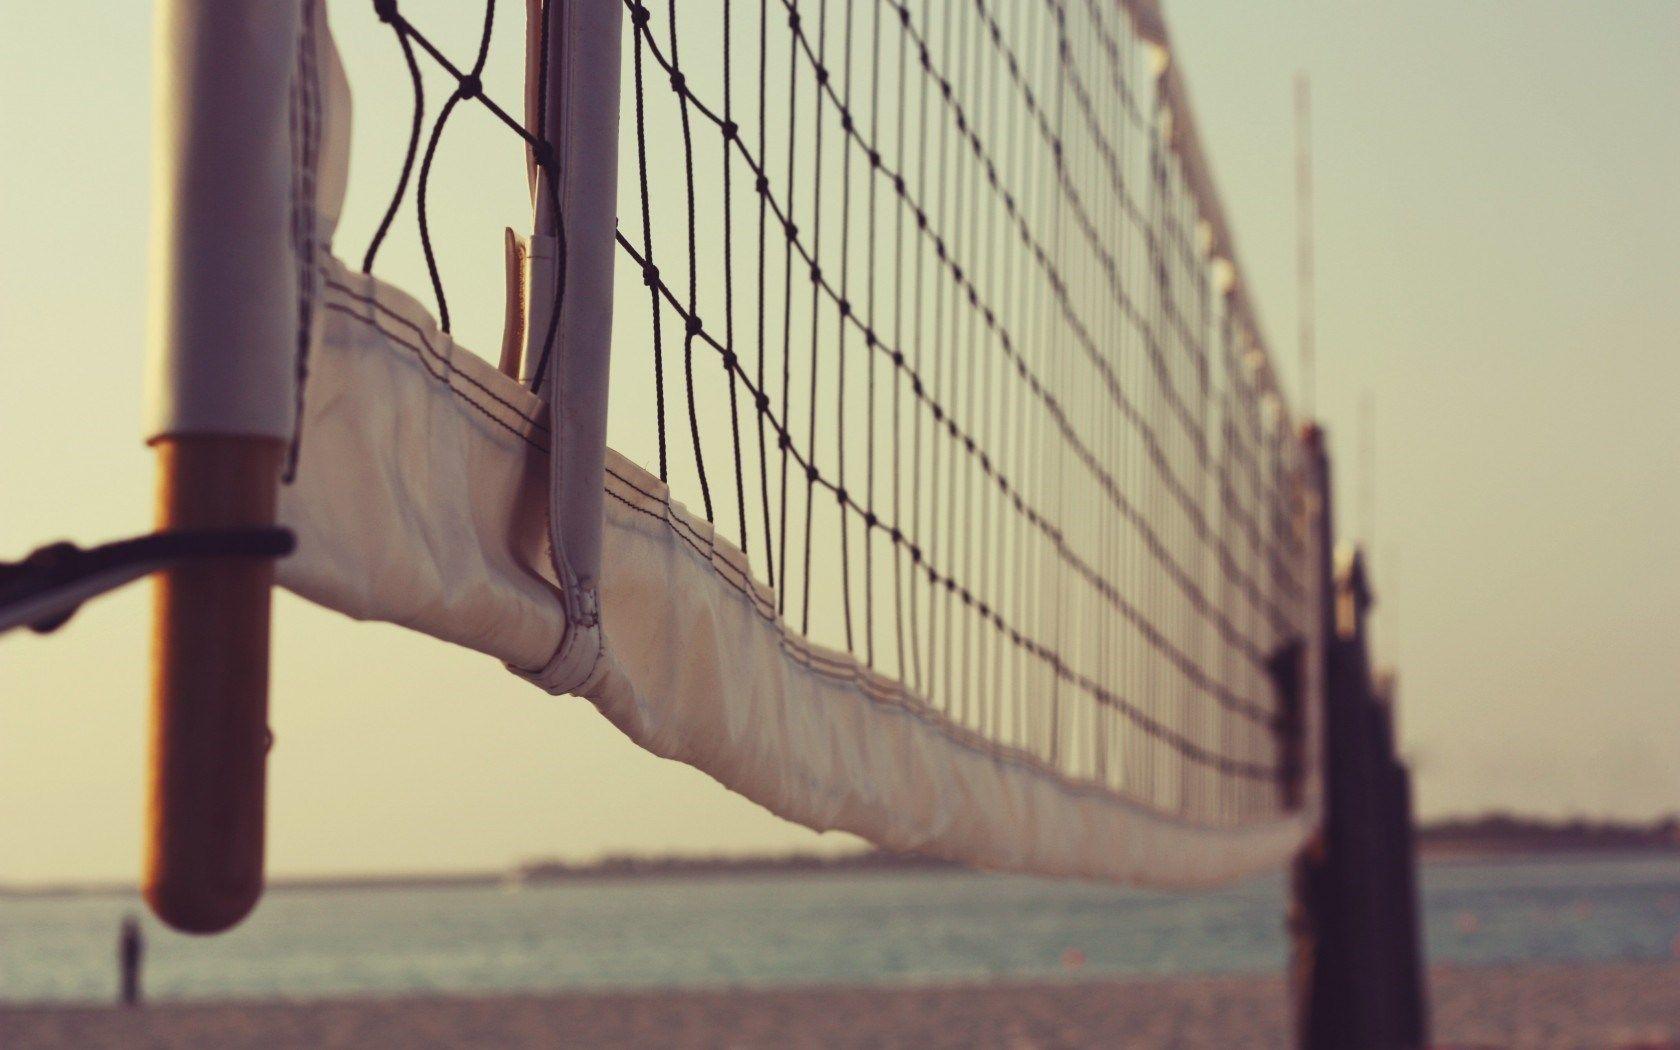 Beach volleyball wallpapers hd ololoshenka pinterest beach volleyball wallpapers hd voltagebd Images